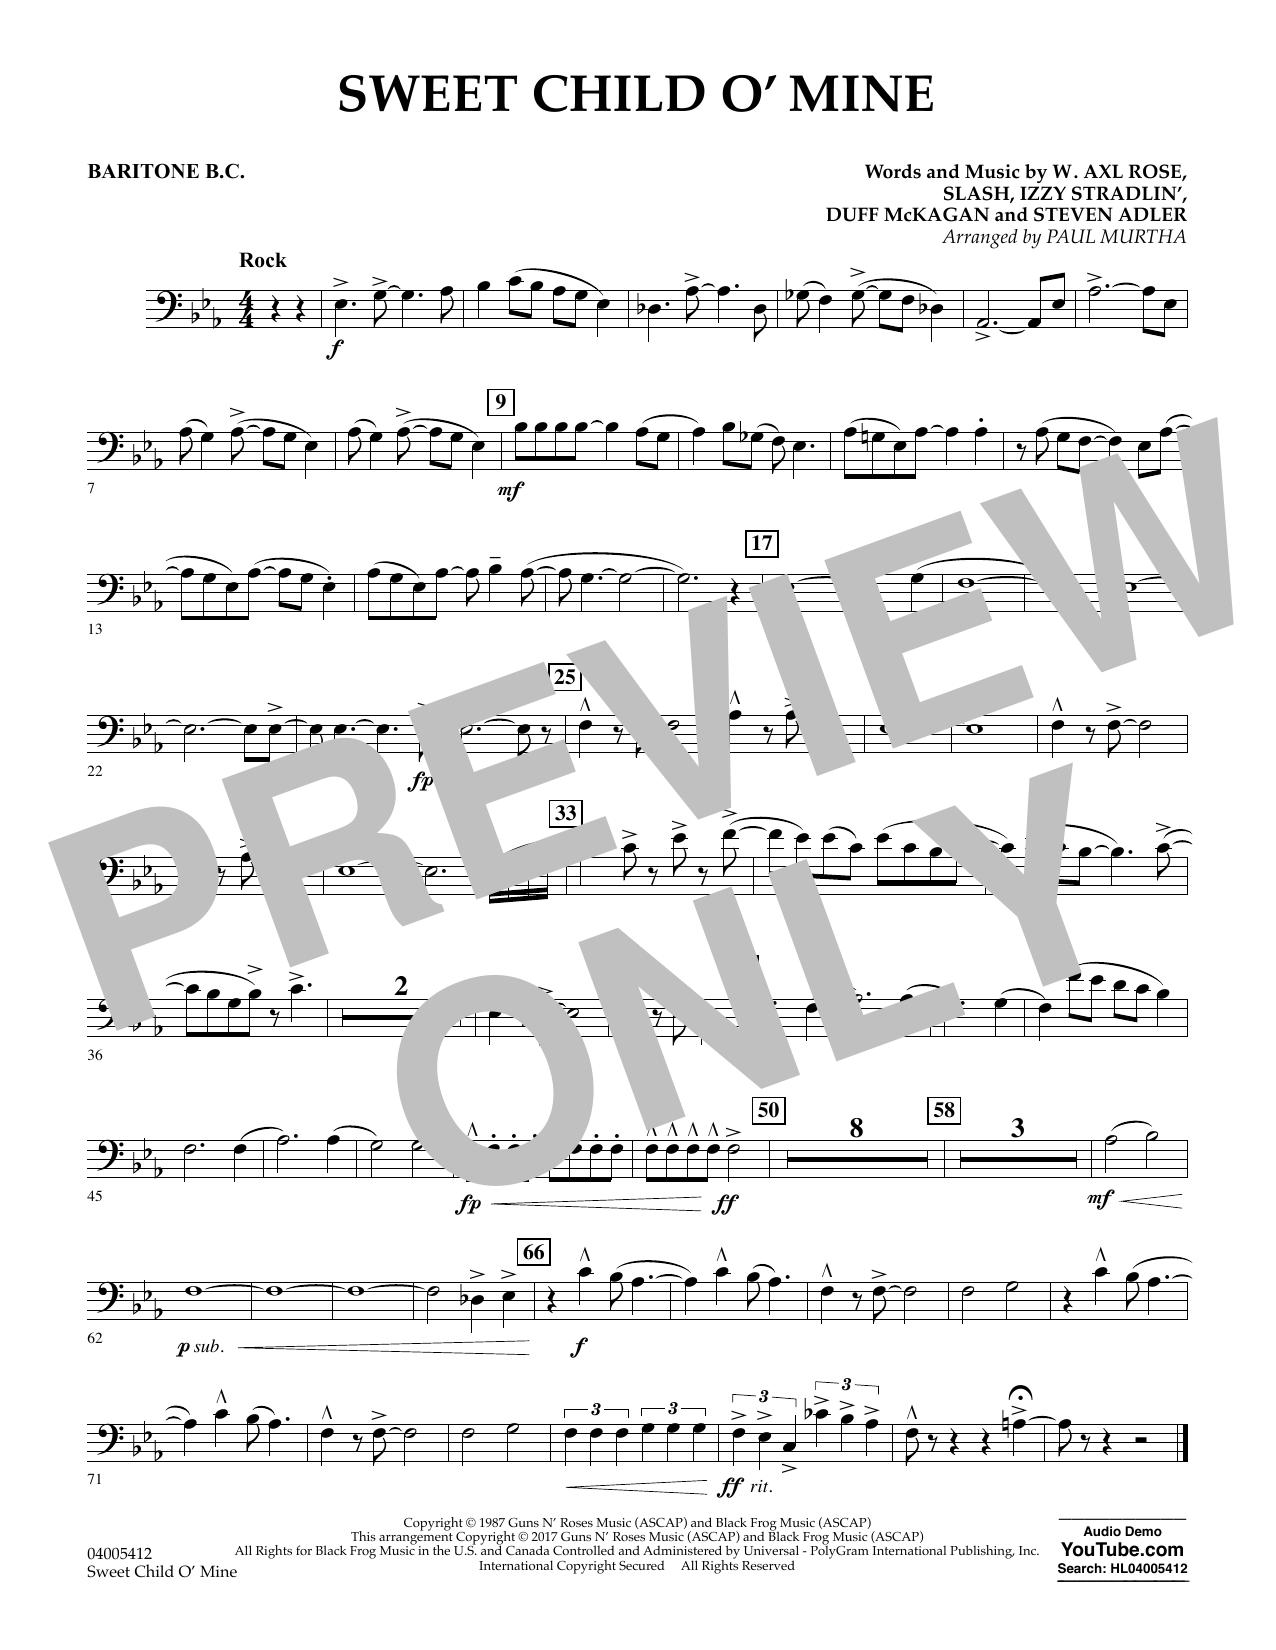 Sweet Child o' Mine - Baritone B.C. (Concert Band)